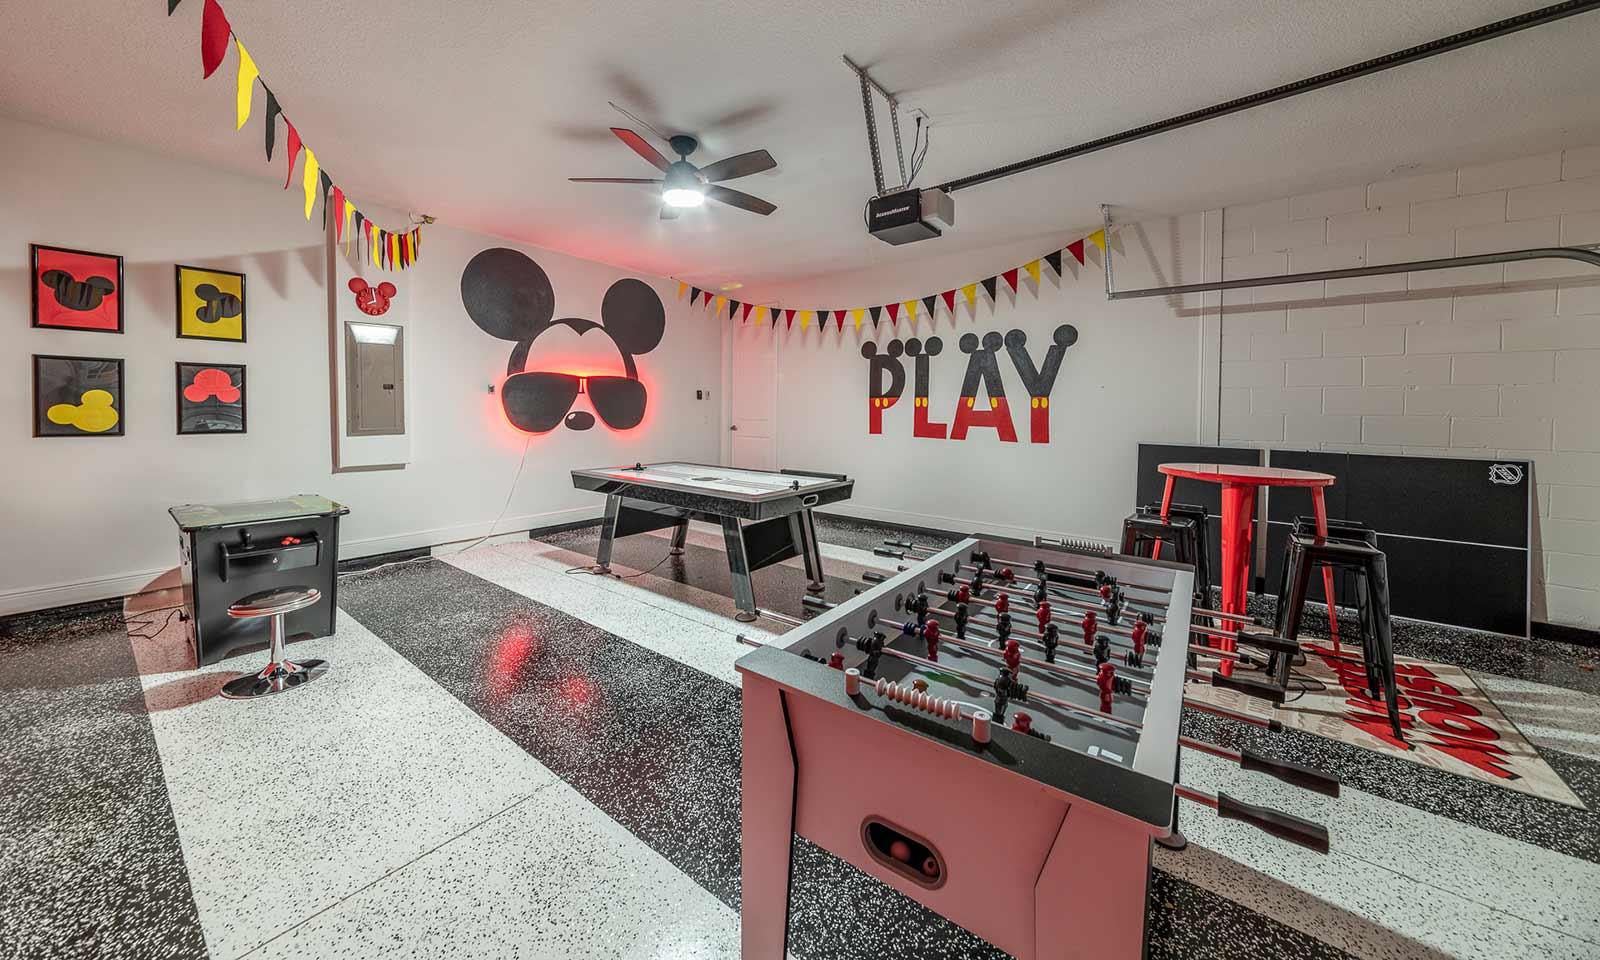 [amenities:game-room:3] Game Room